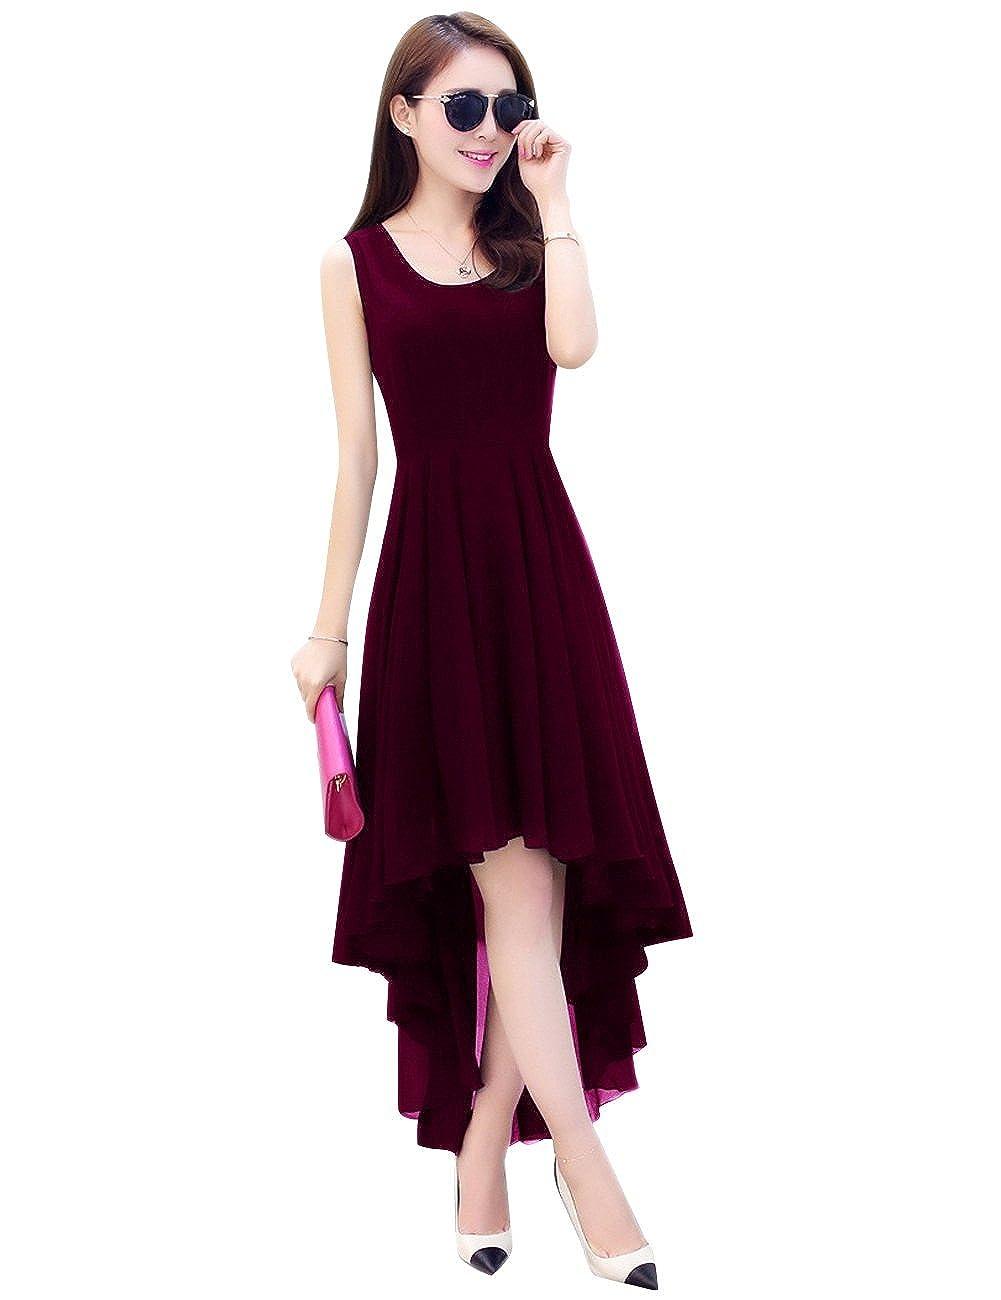 Wine Dasior Women's ALine Asymmetric High Low Summer Beach Holiday Party Dress